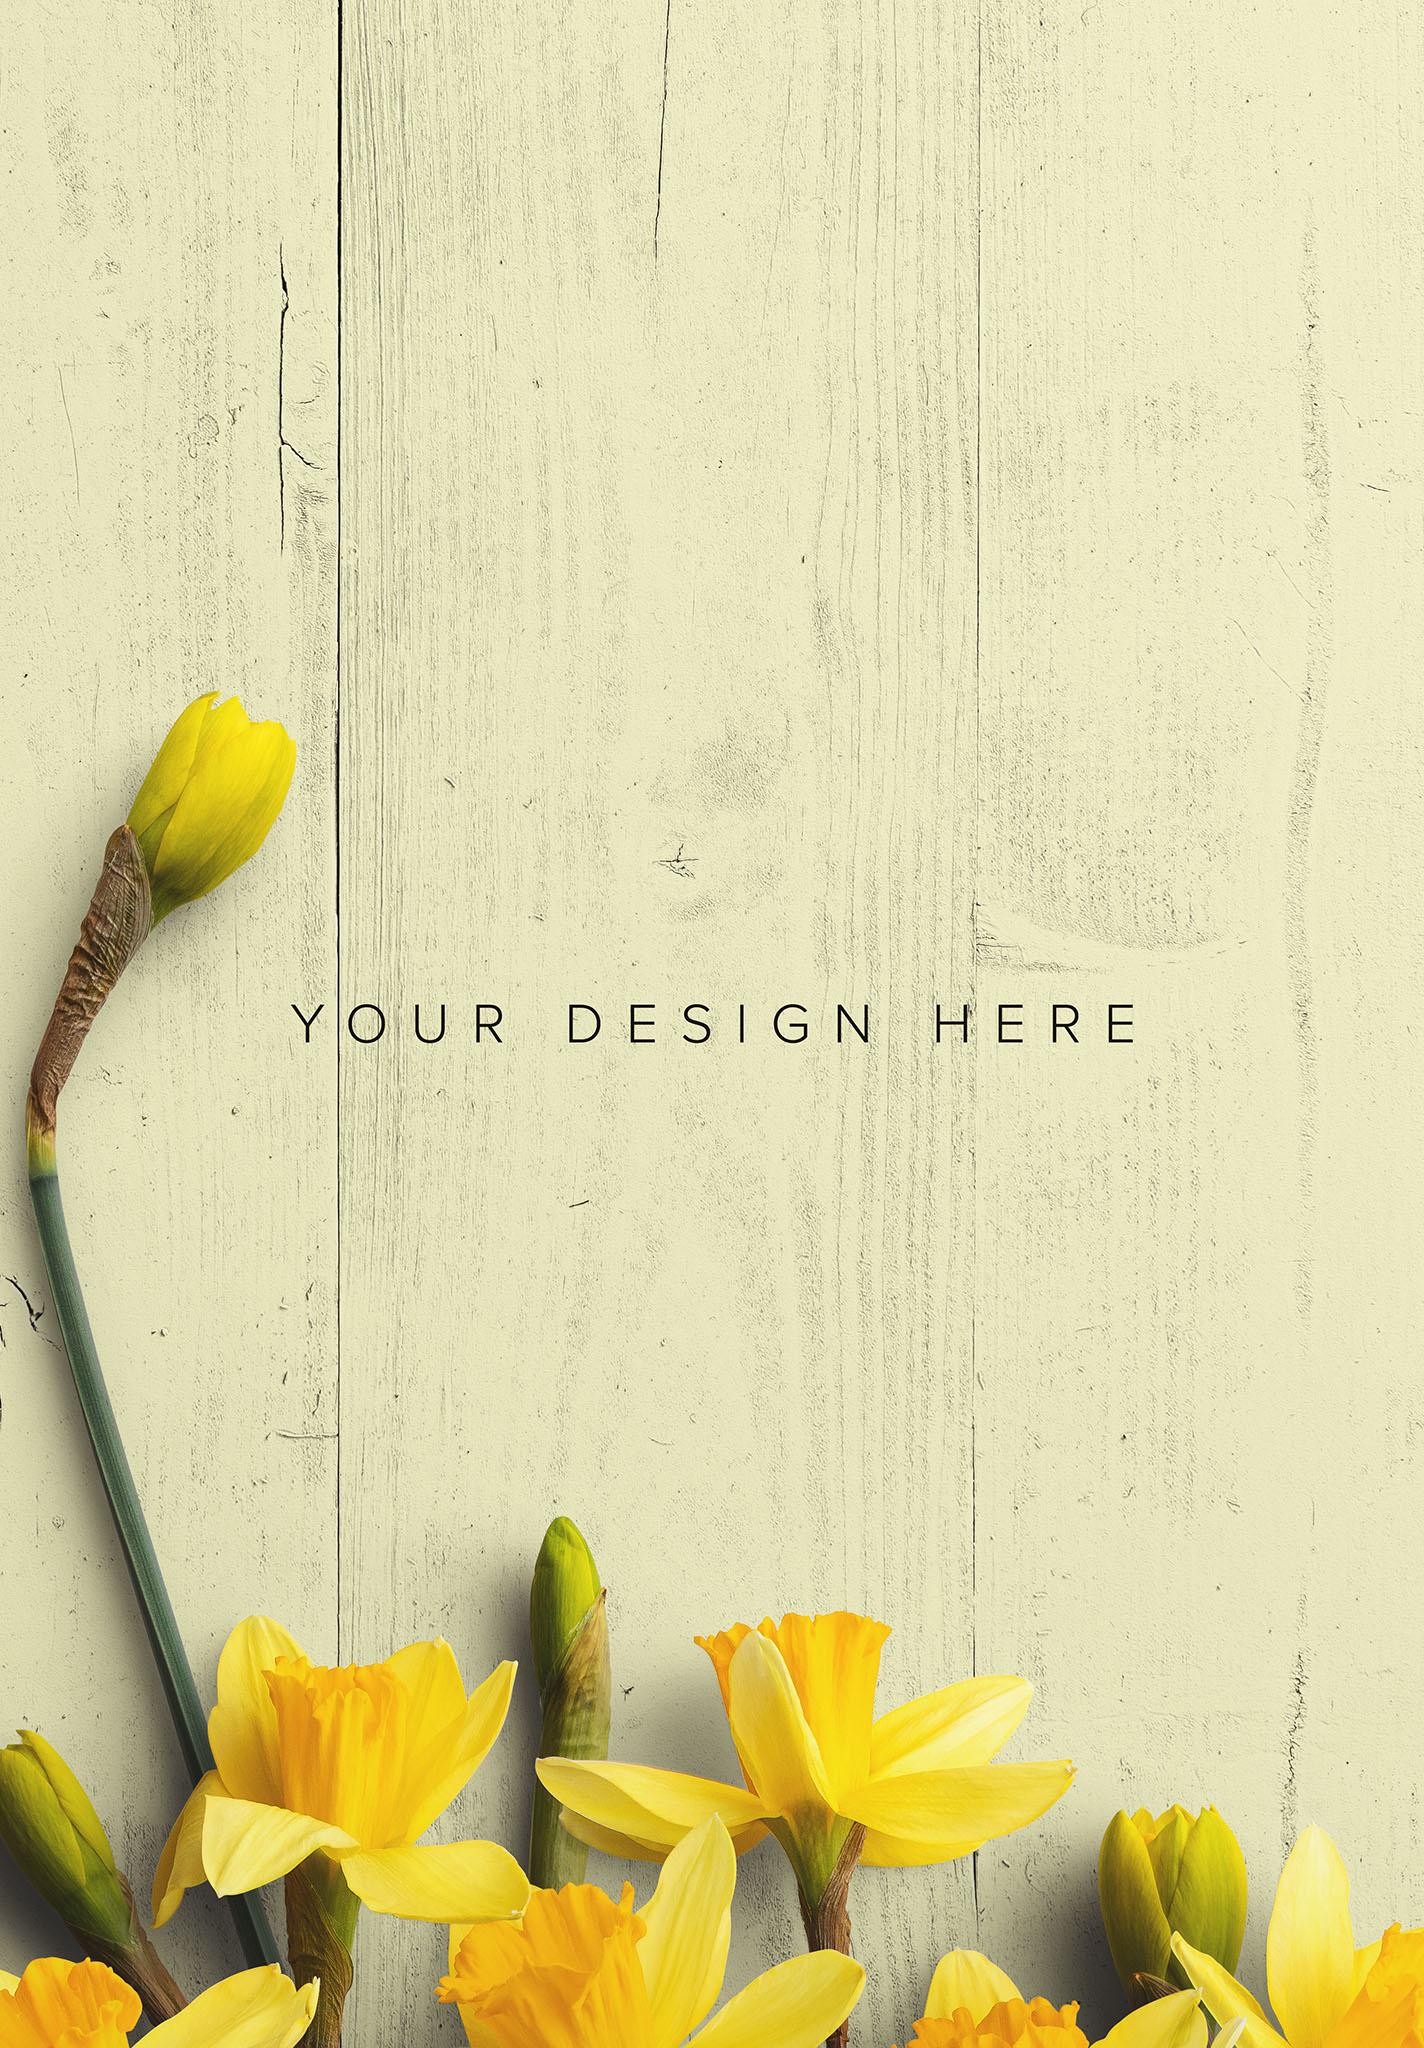 Daffodils Custom Scene Creator Template 6 Image03